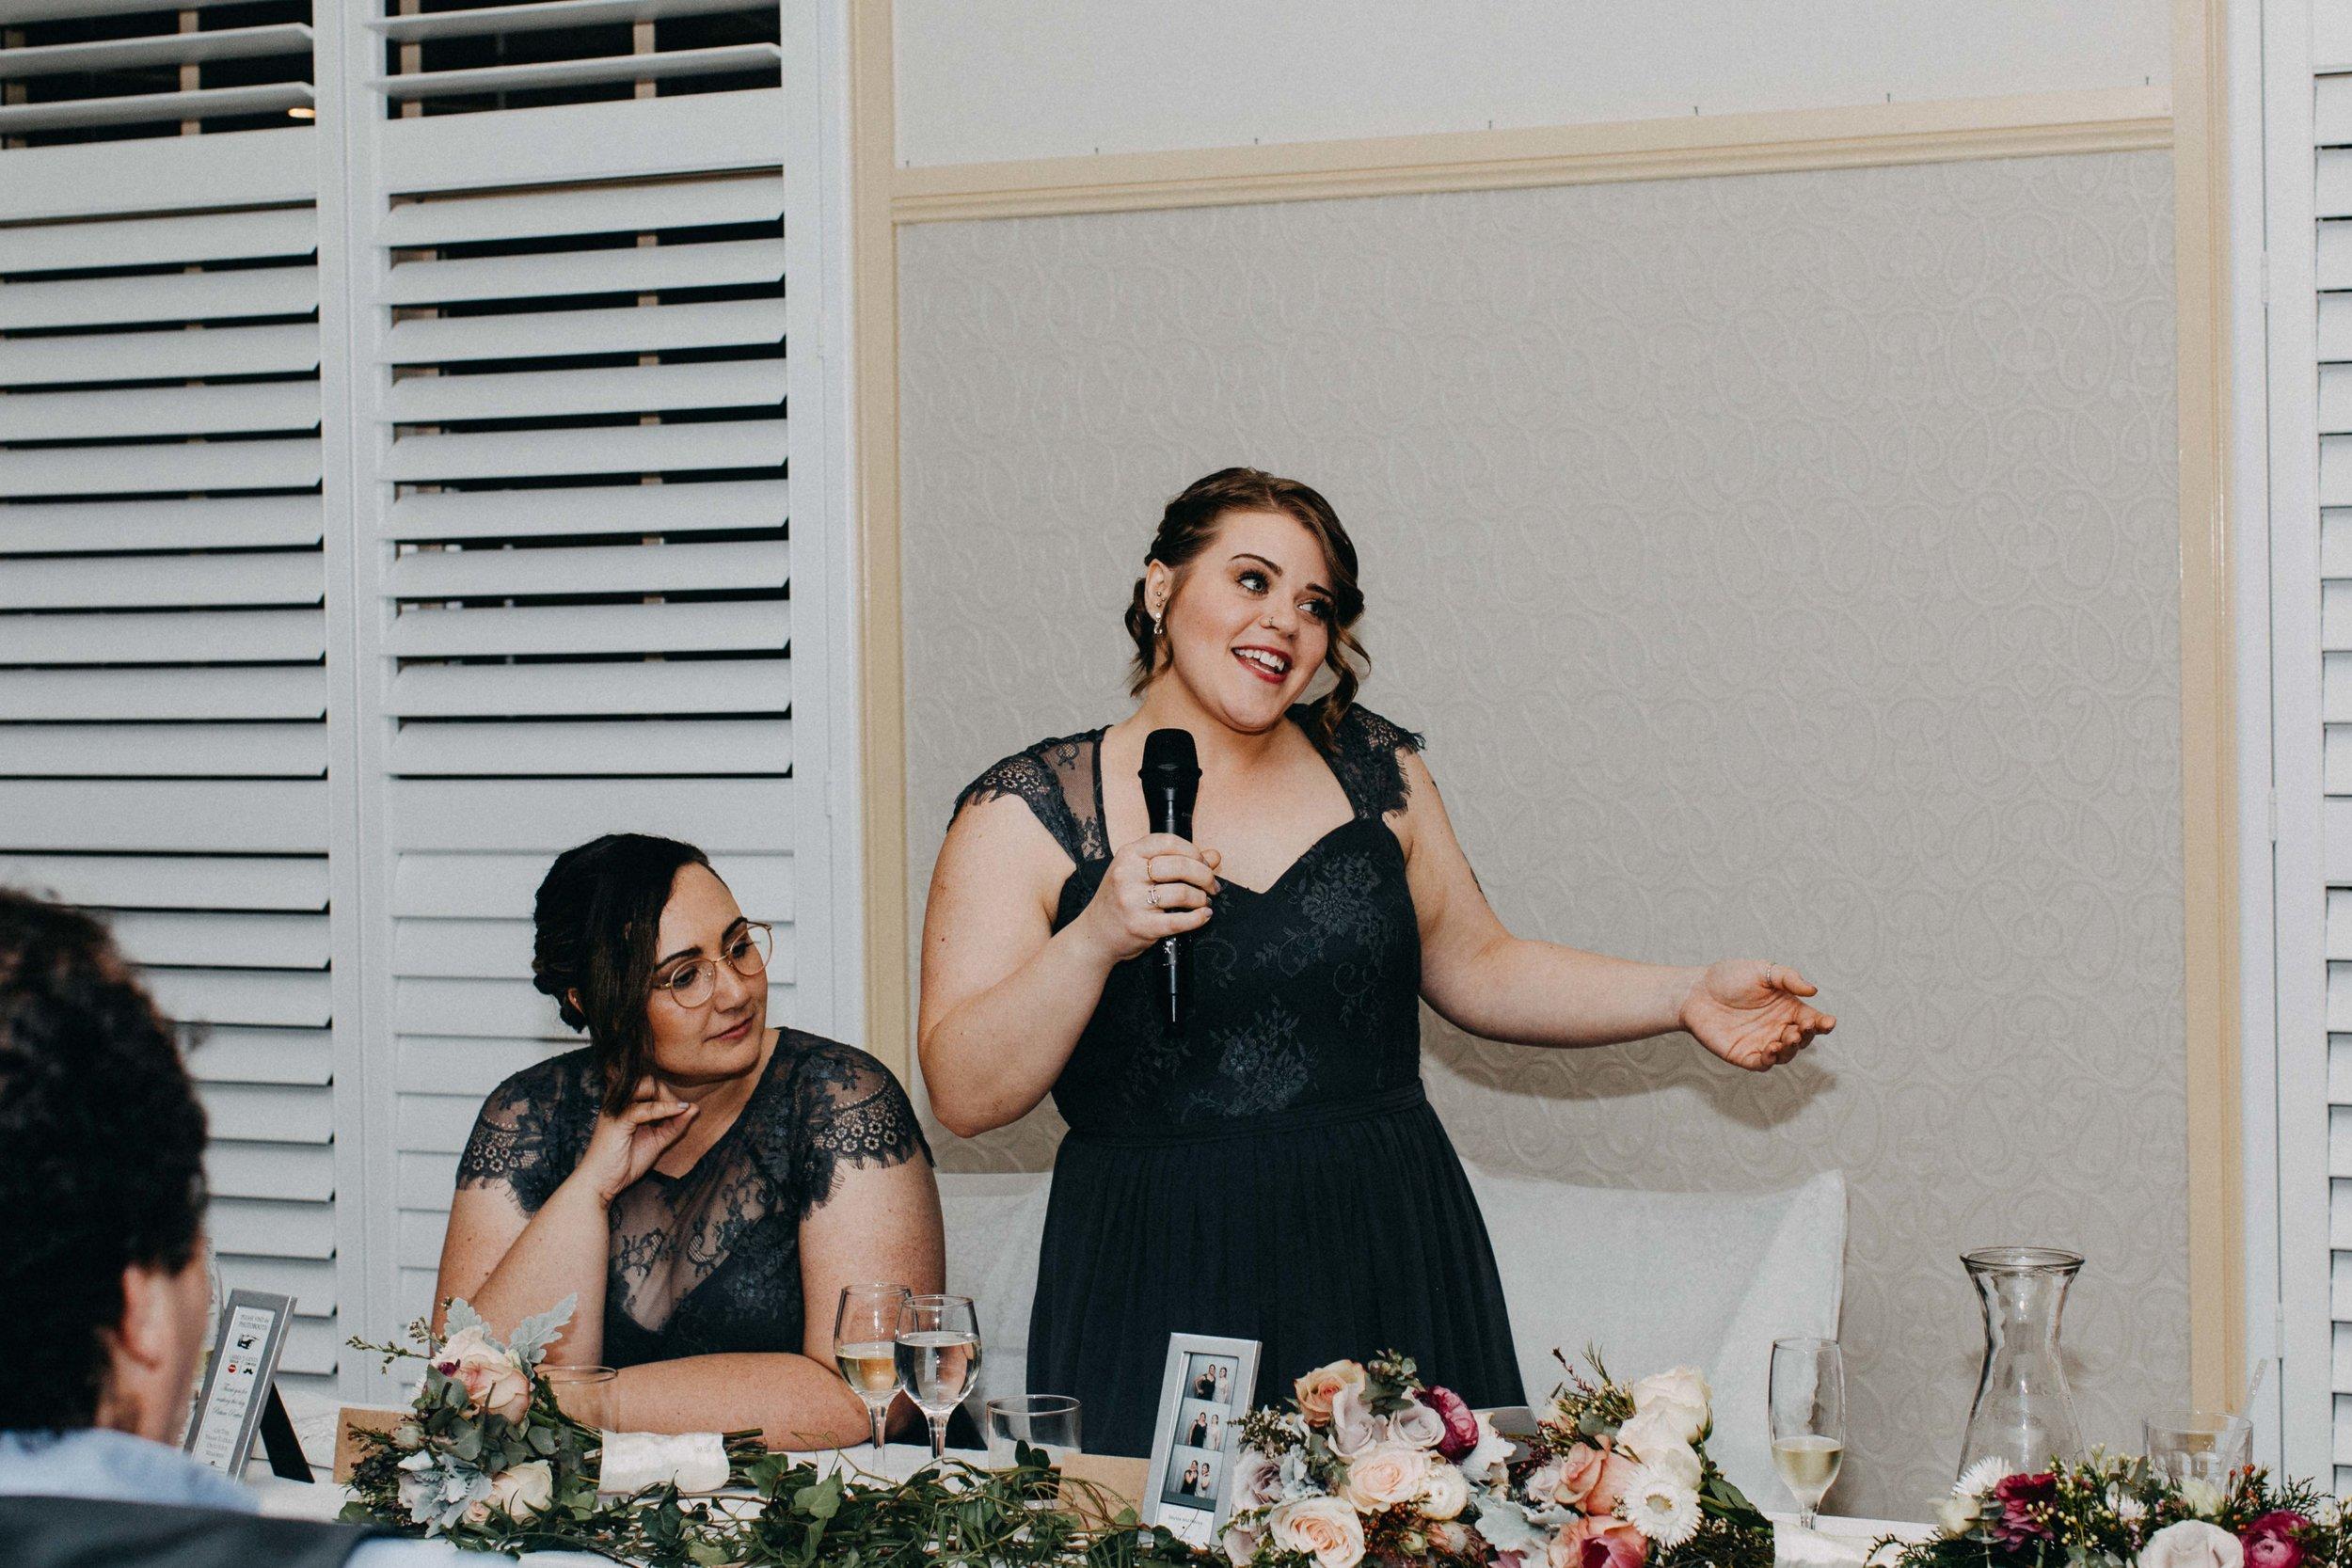 appin-house-wedding-macarthur-www.emilyobrienphotography.net-168.jpg